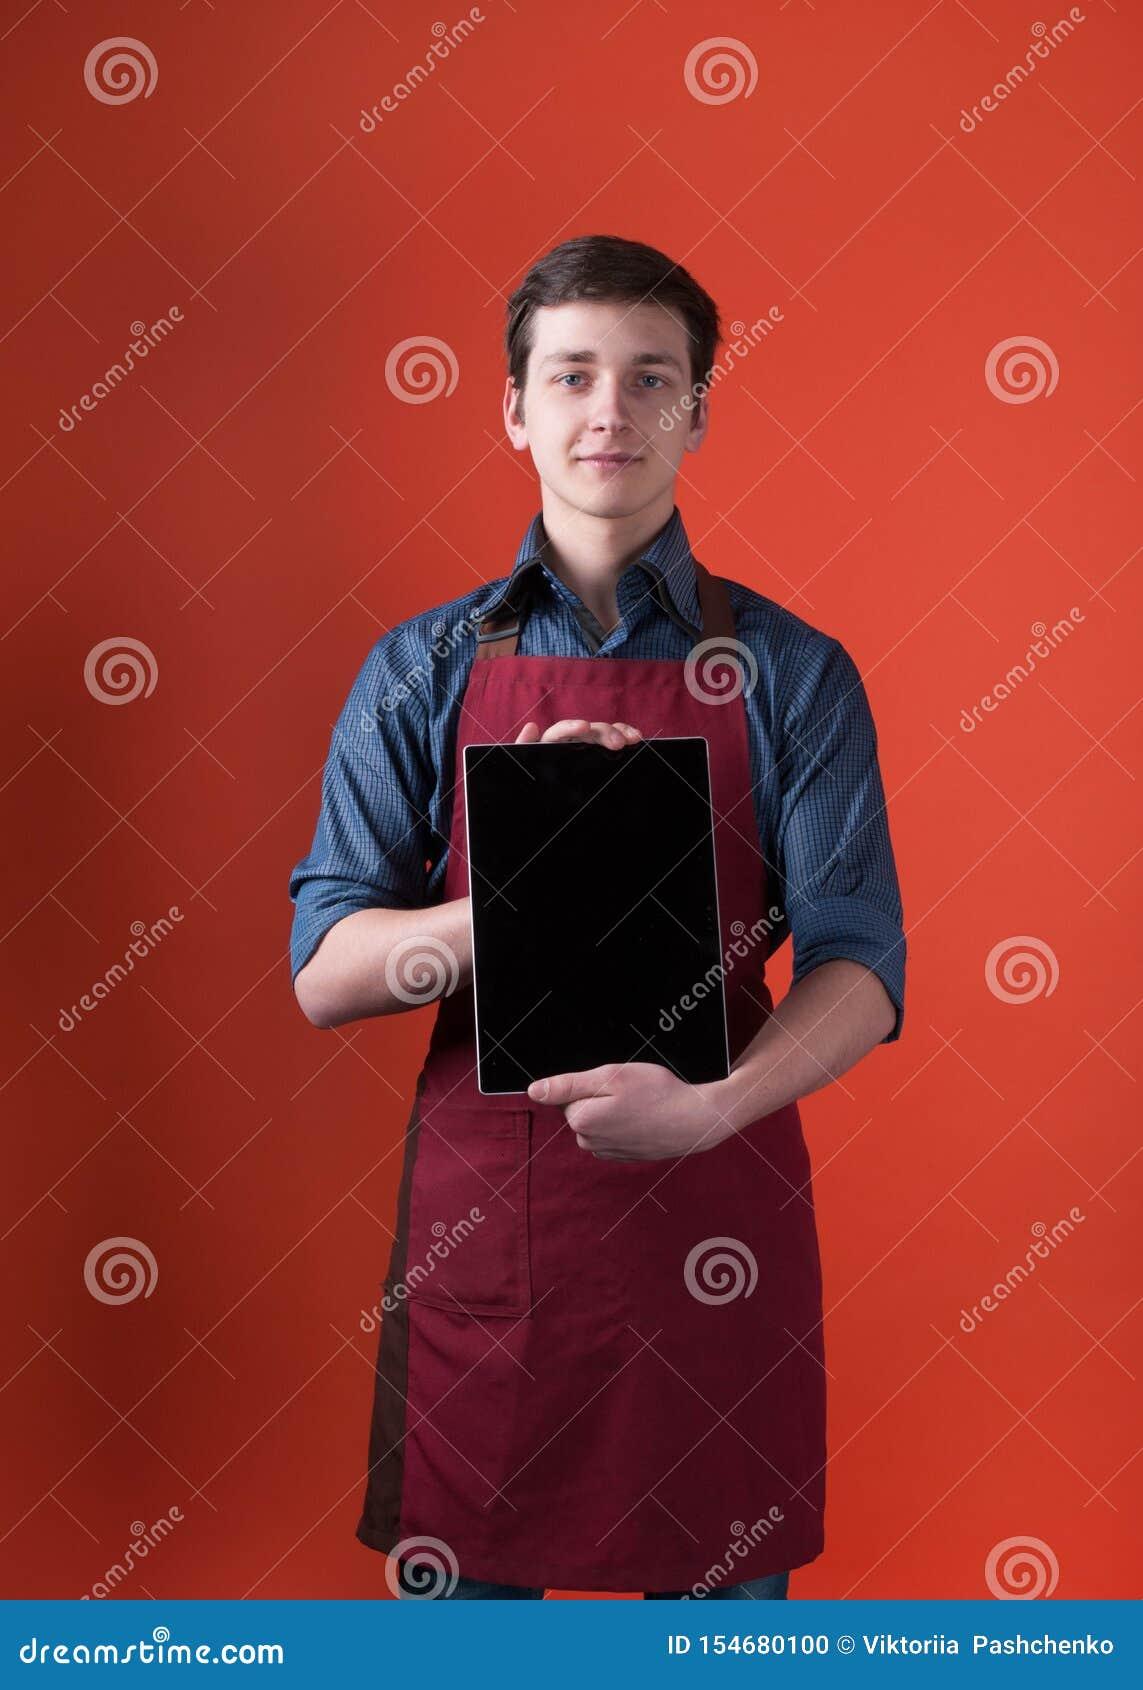 Barista με τη σκοτεινή τρίχα στο μπλε πουκάμισο και burgundy ποδιά που κρατά και που παρουσιάζει ψηφιακή ταμπλέτα με την κενή οθό